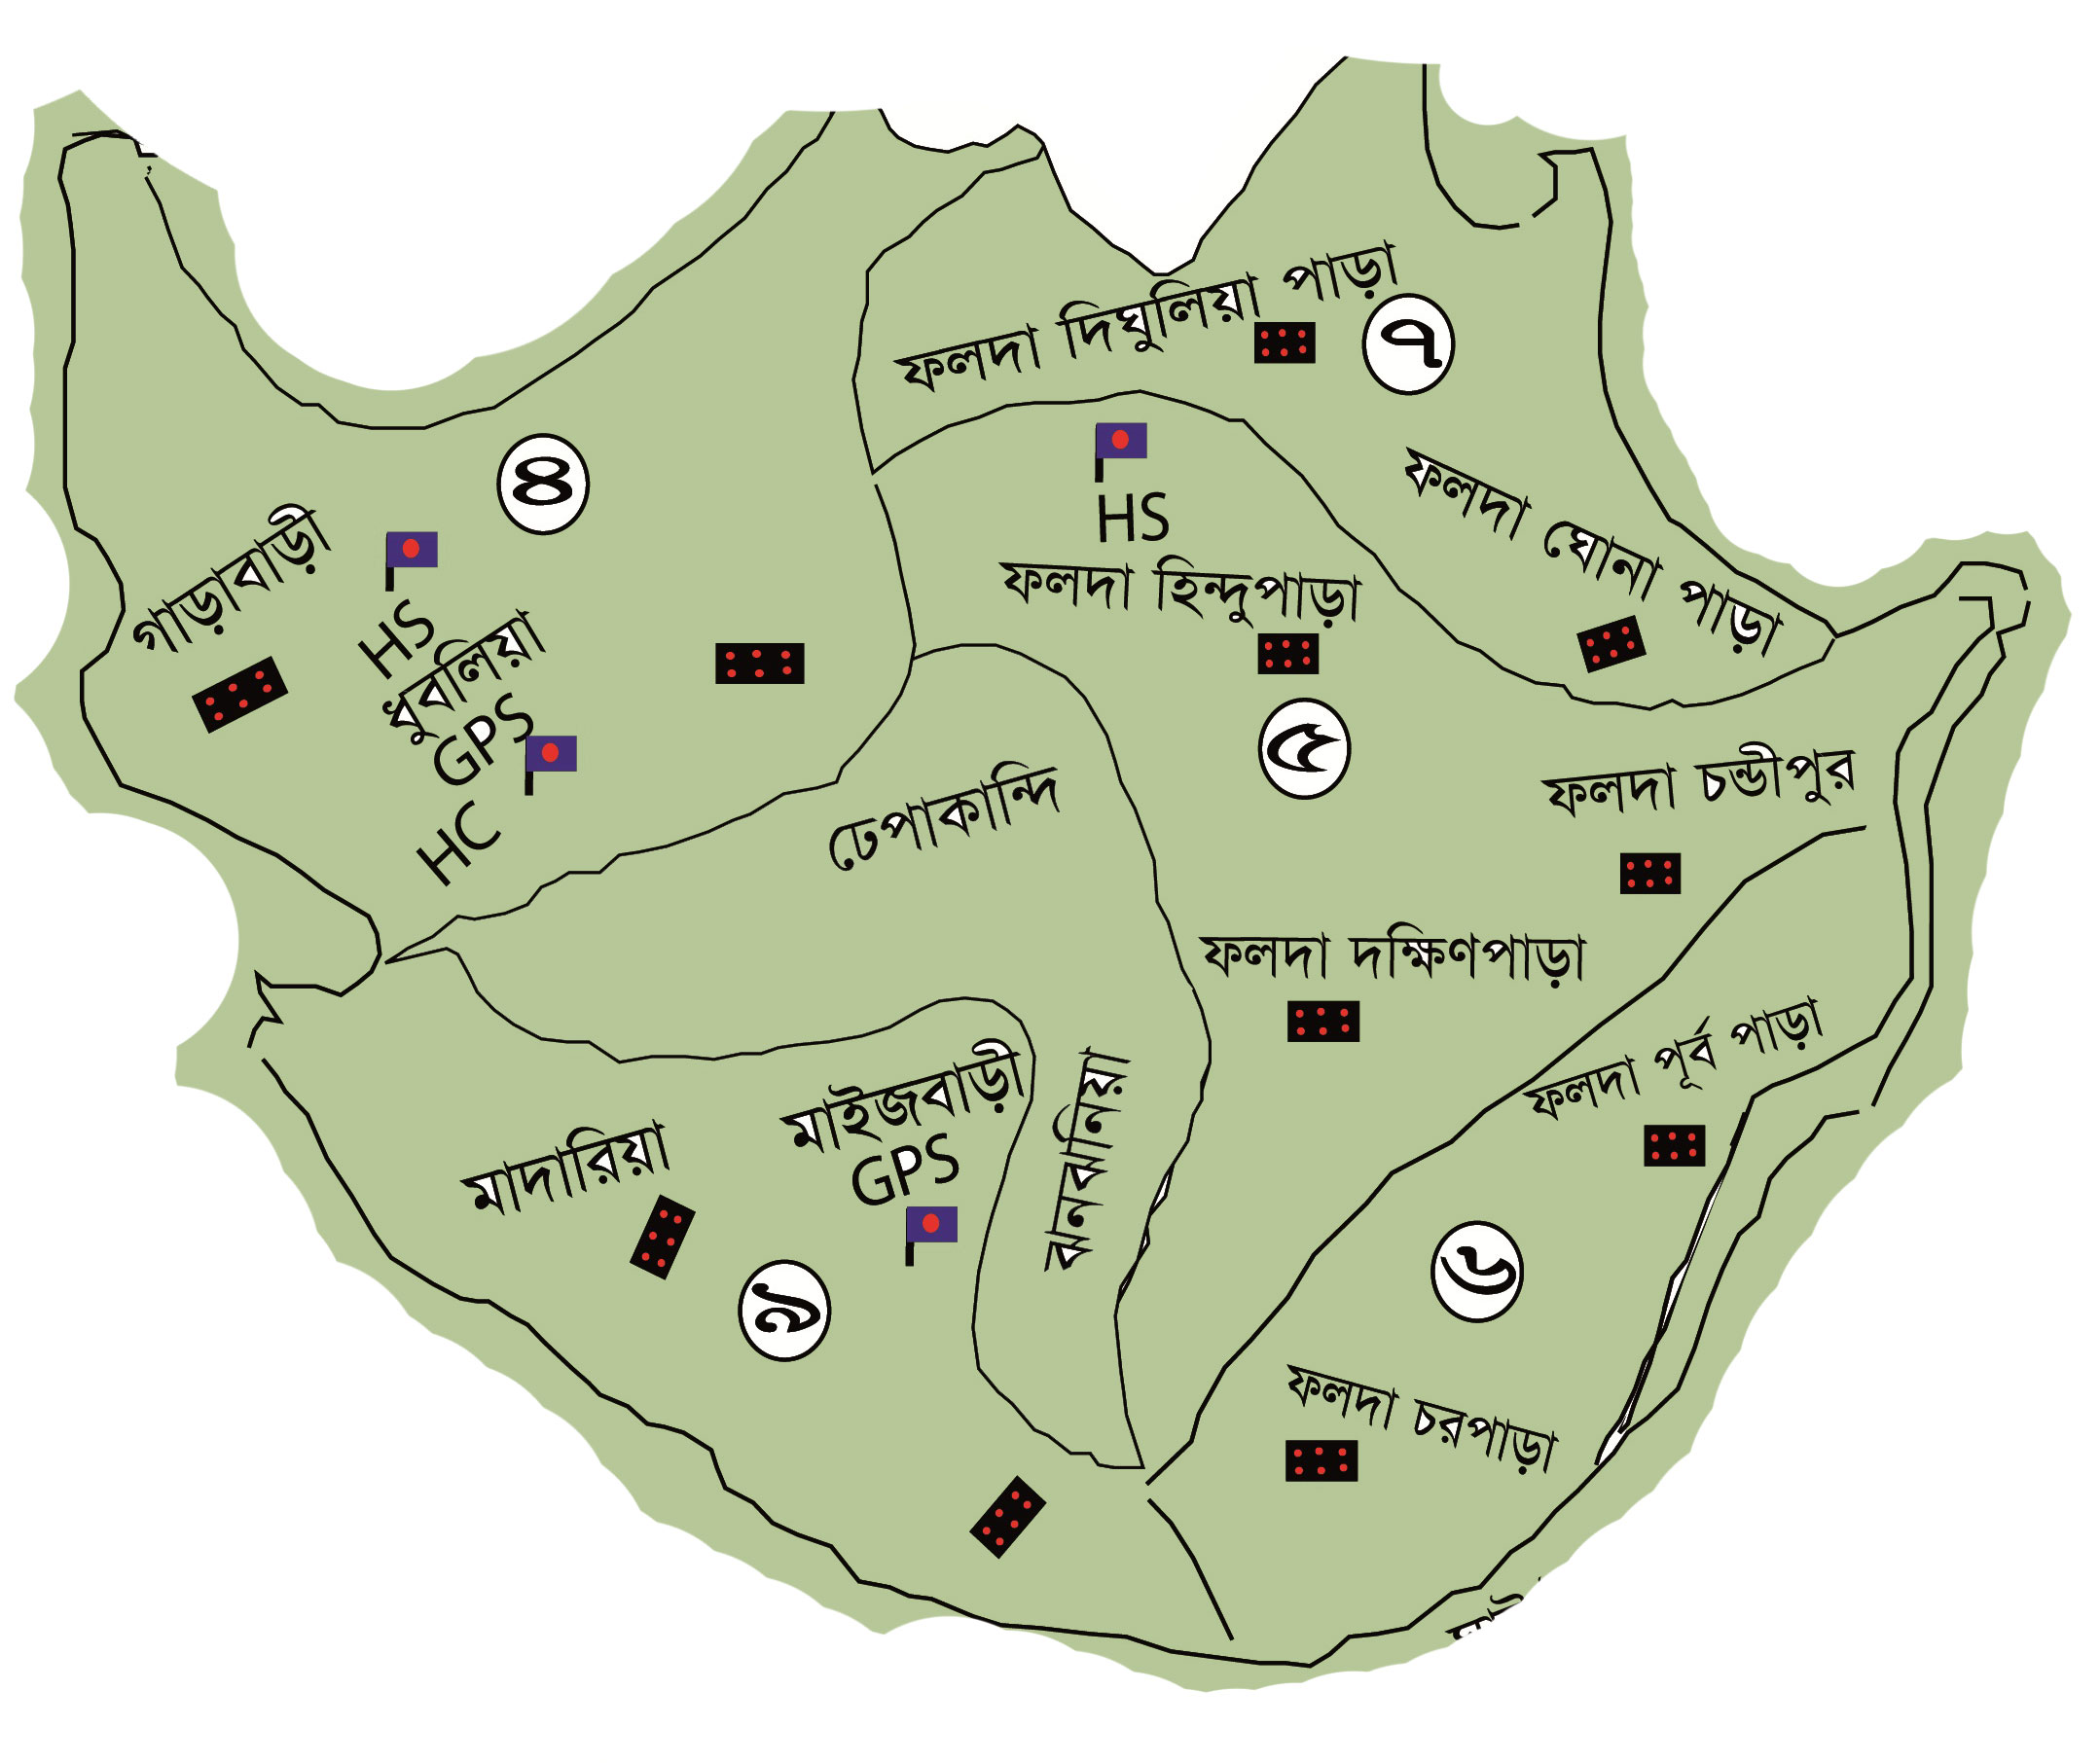 Falda Union Parishad - Tangail map